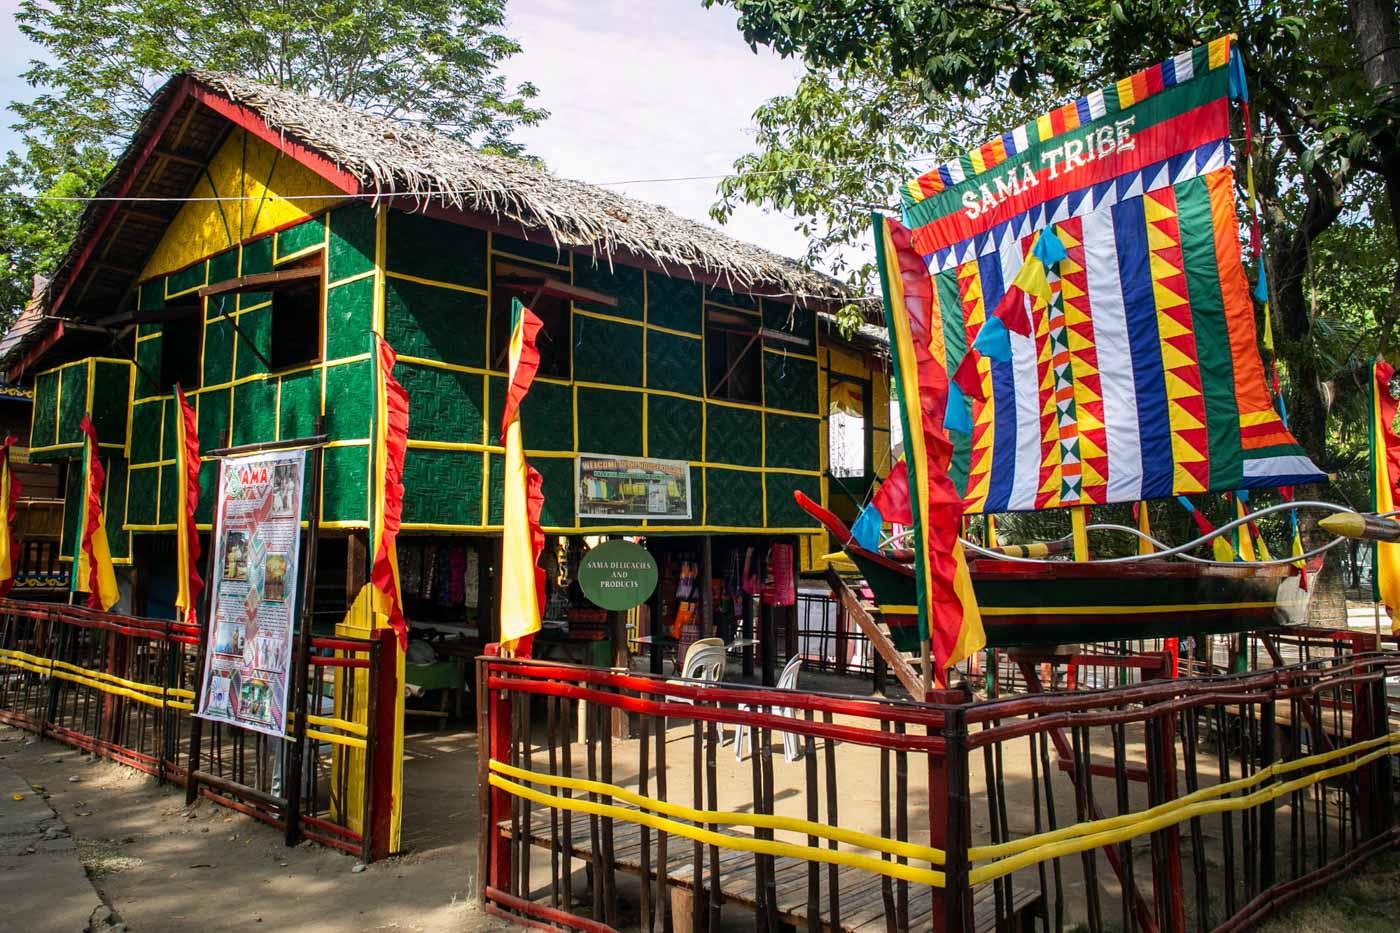 IN PHOTOS: Davao City's rich culture, as told through the